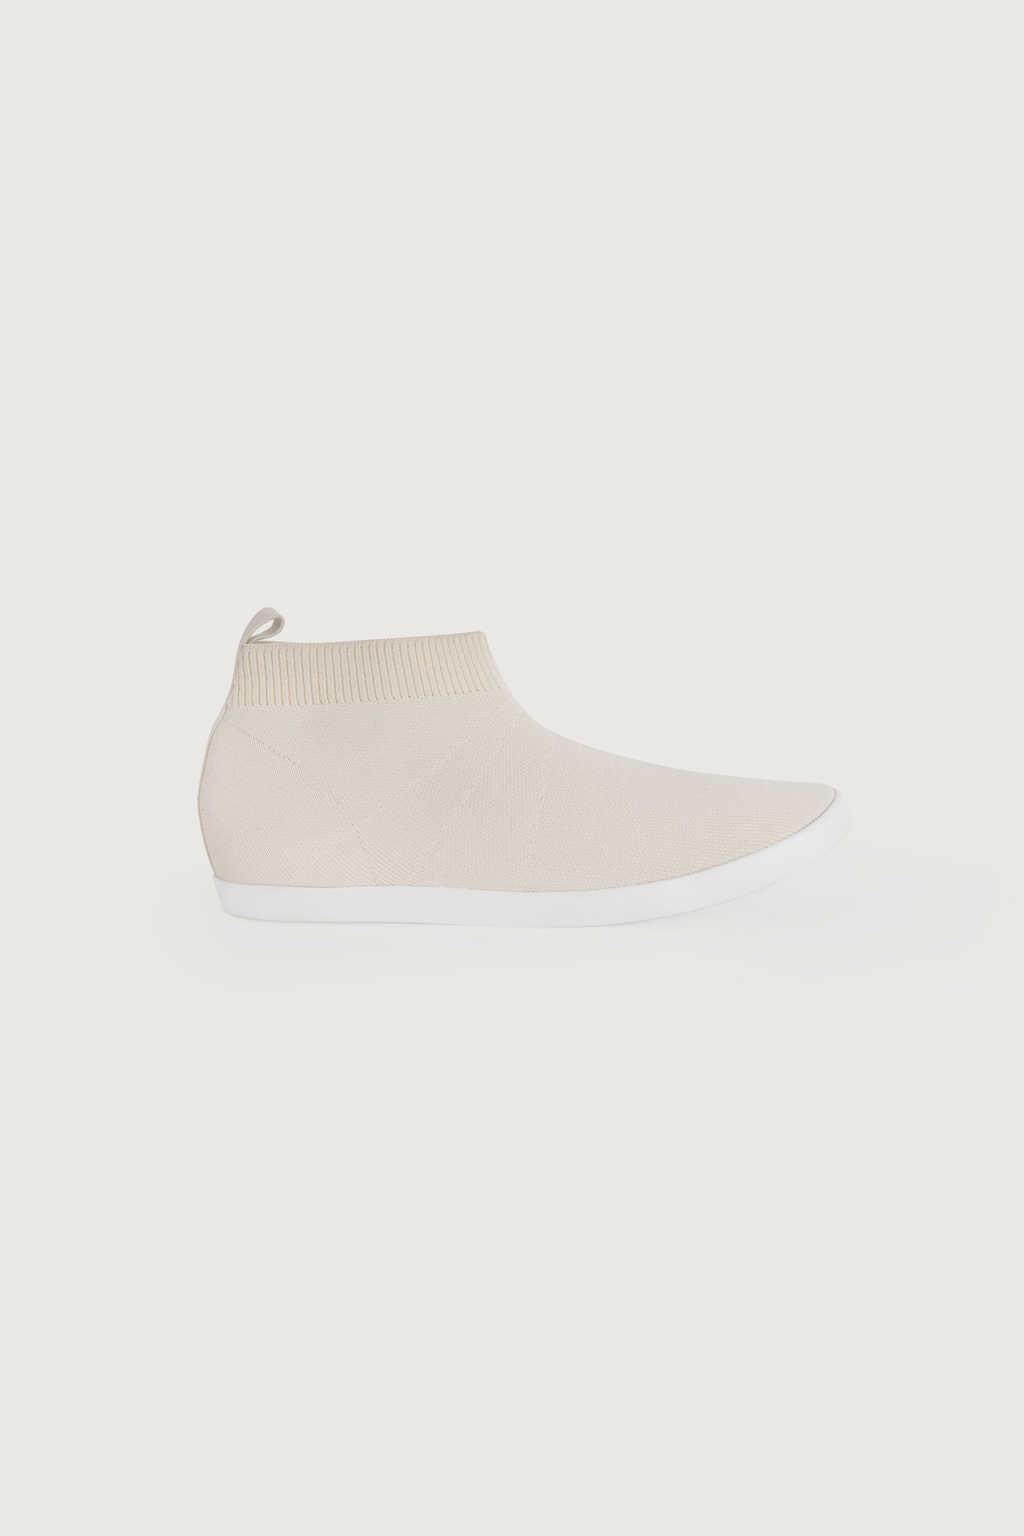 Sneaker 3334 Cream 4